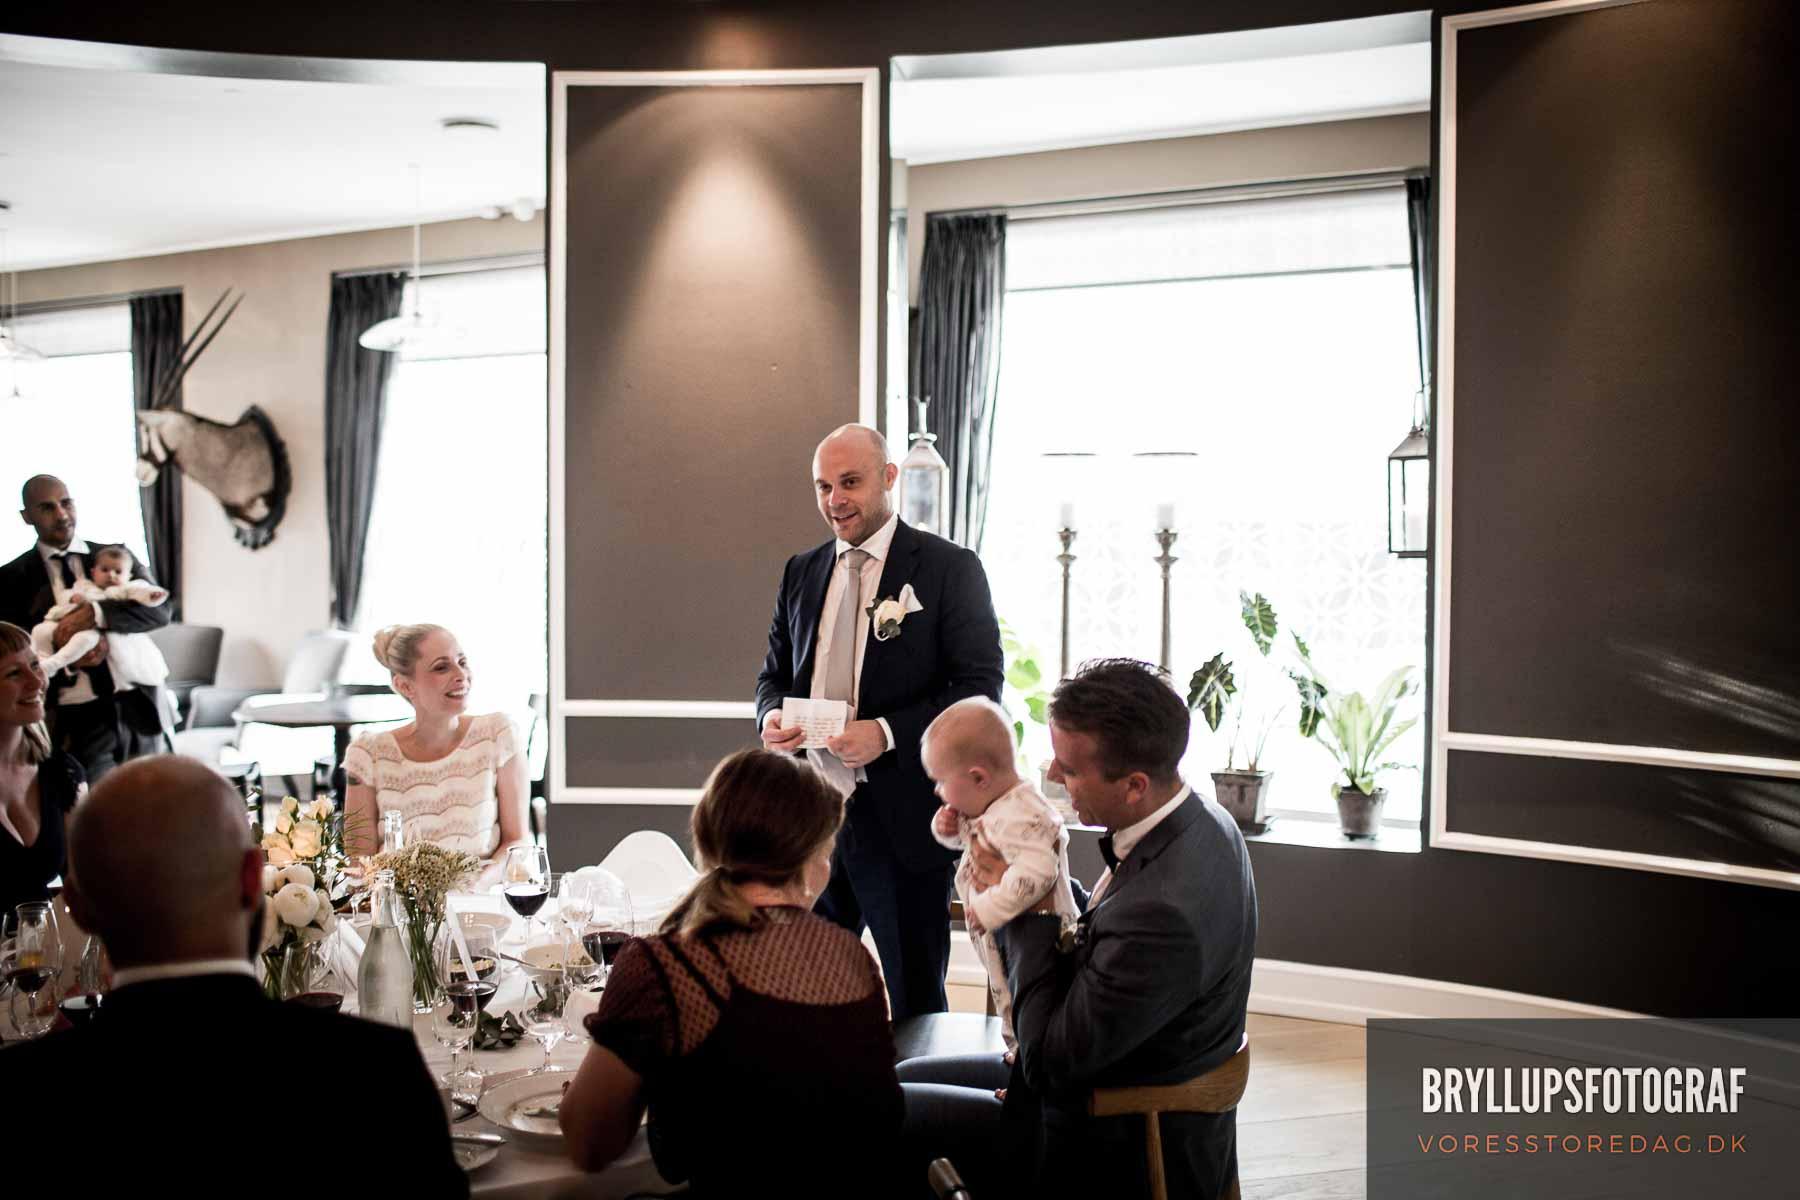 Bryllupskage på kagebord Nimb Terrasse Tivoli